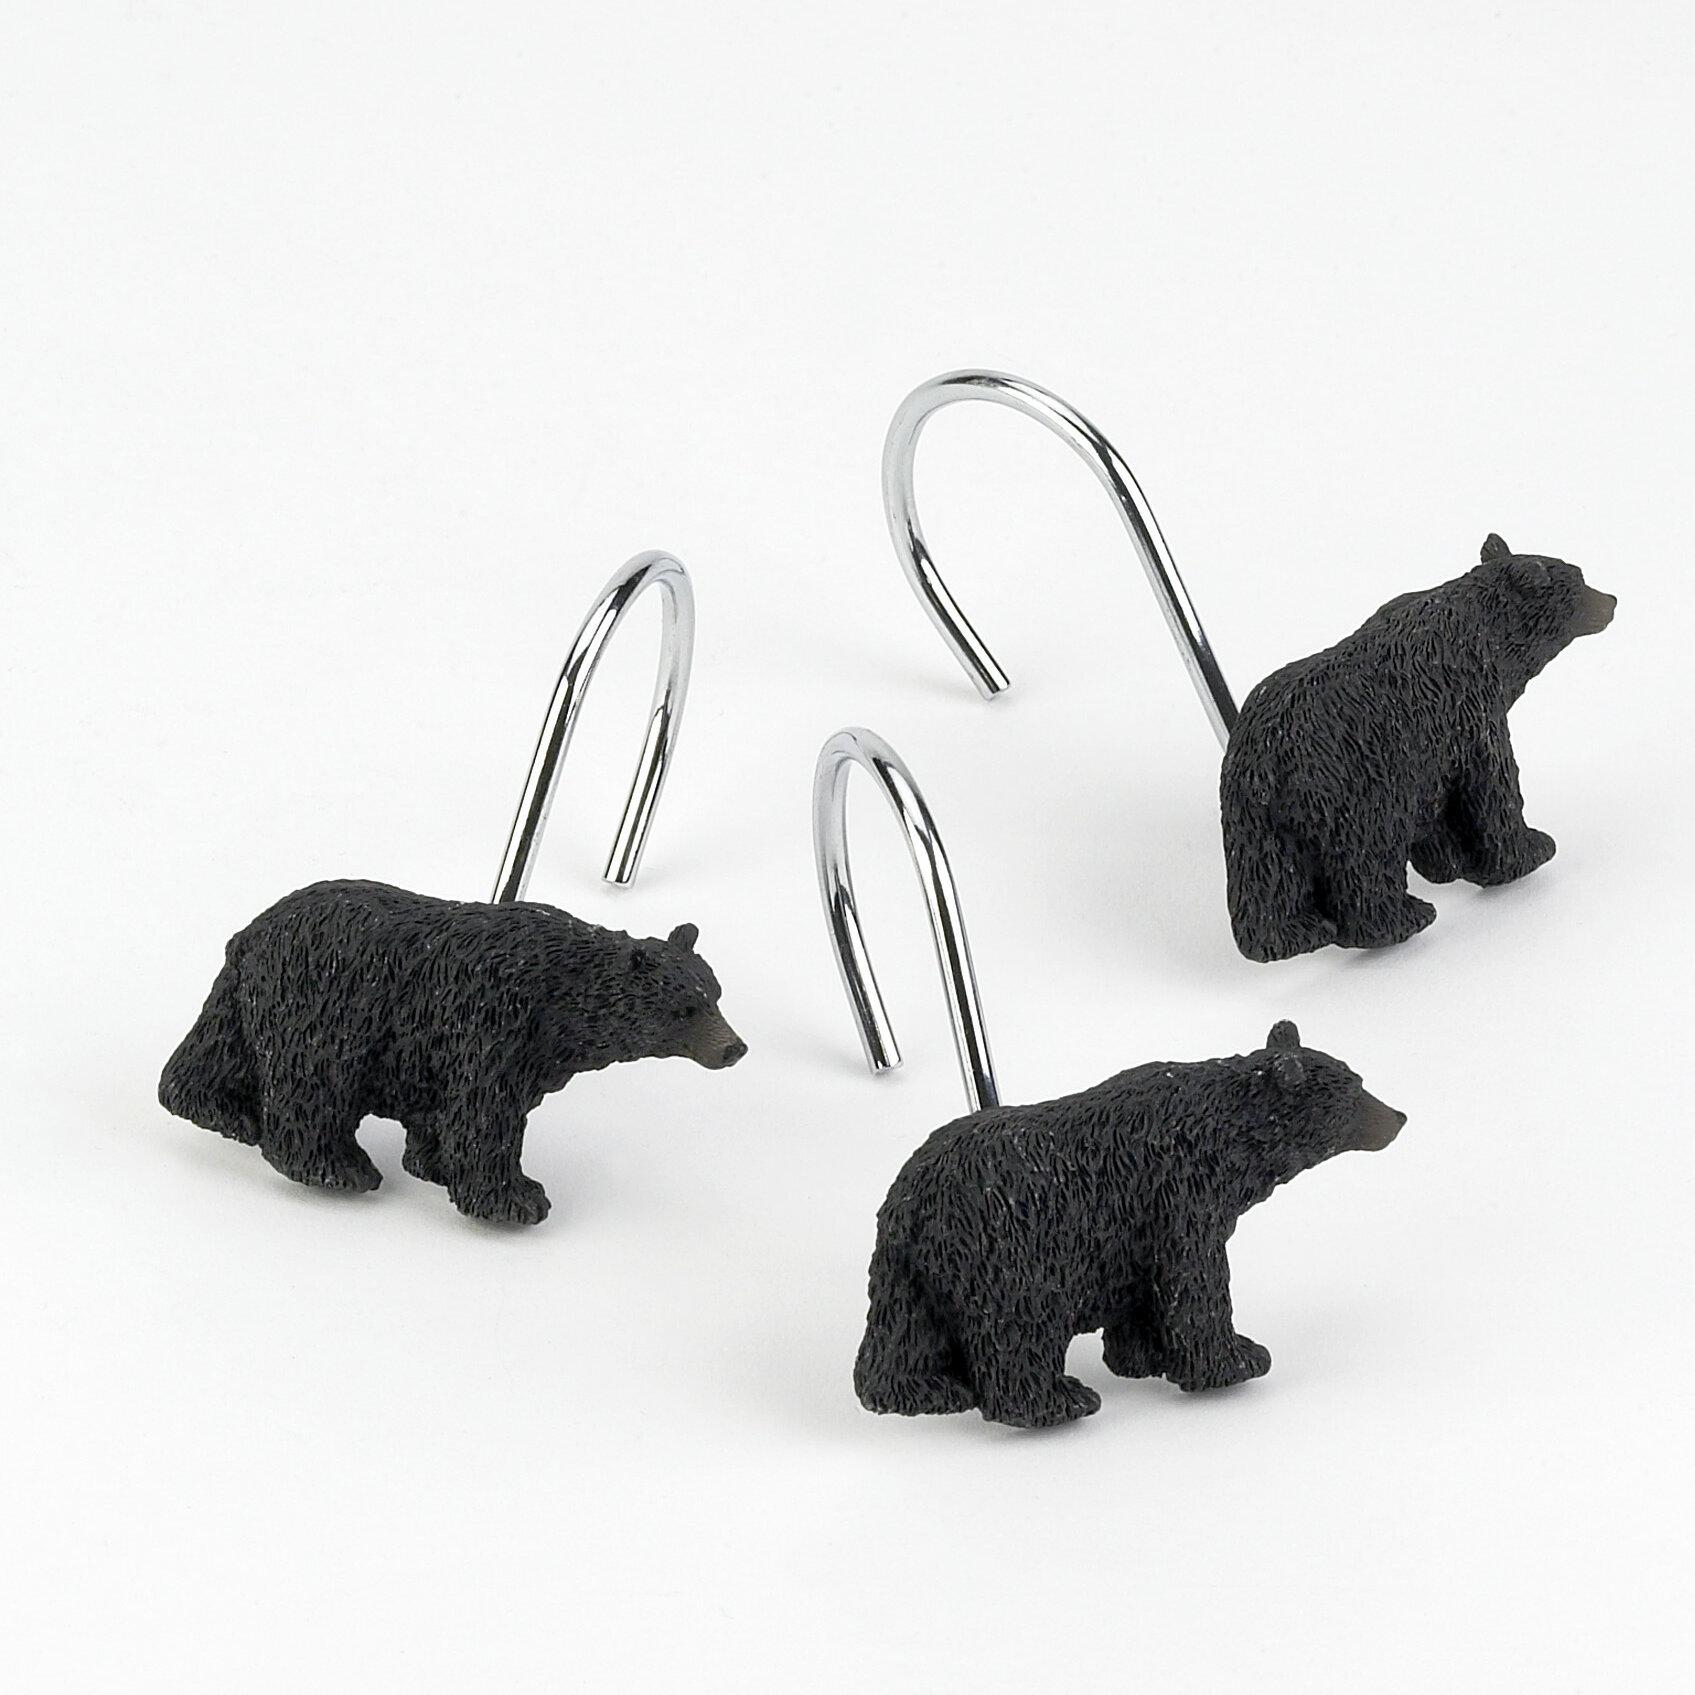 Avanti Black Bear Bath Collection Shower Curtain and Bath Accessories